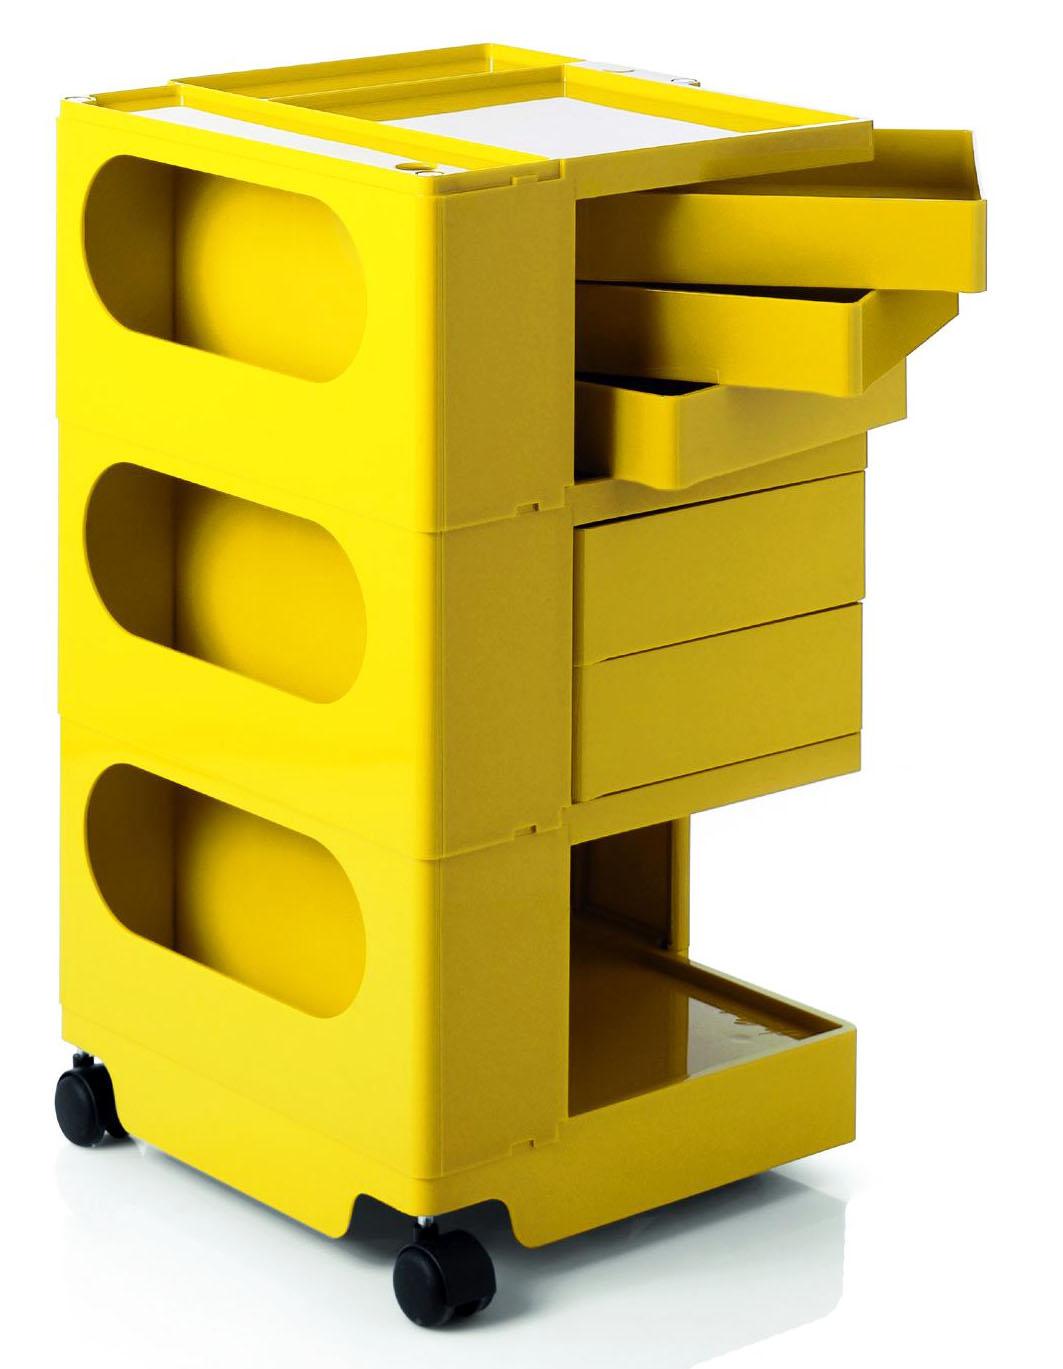 Joe Colombo Boby Trolley | modern design by moderndesign.org